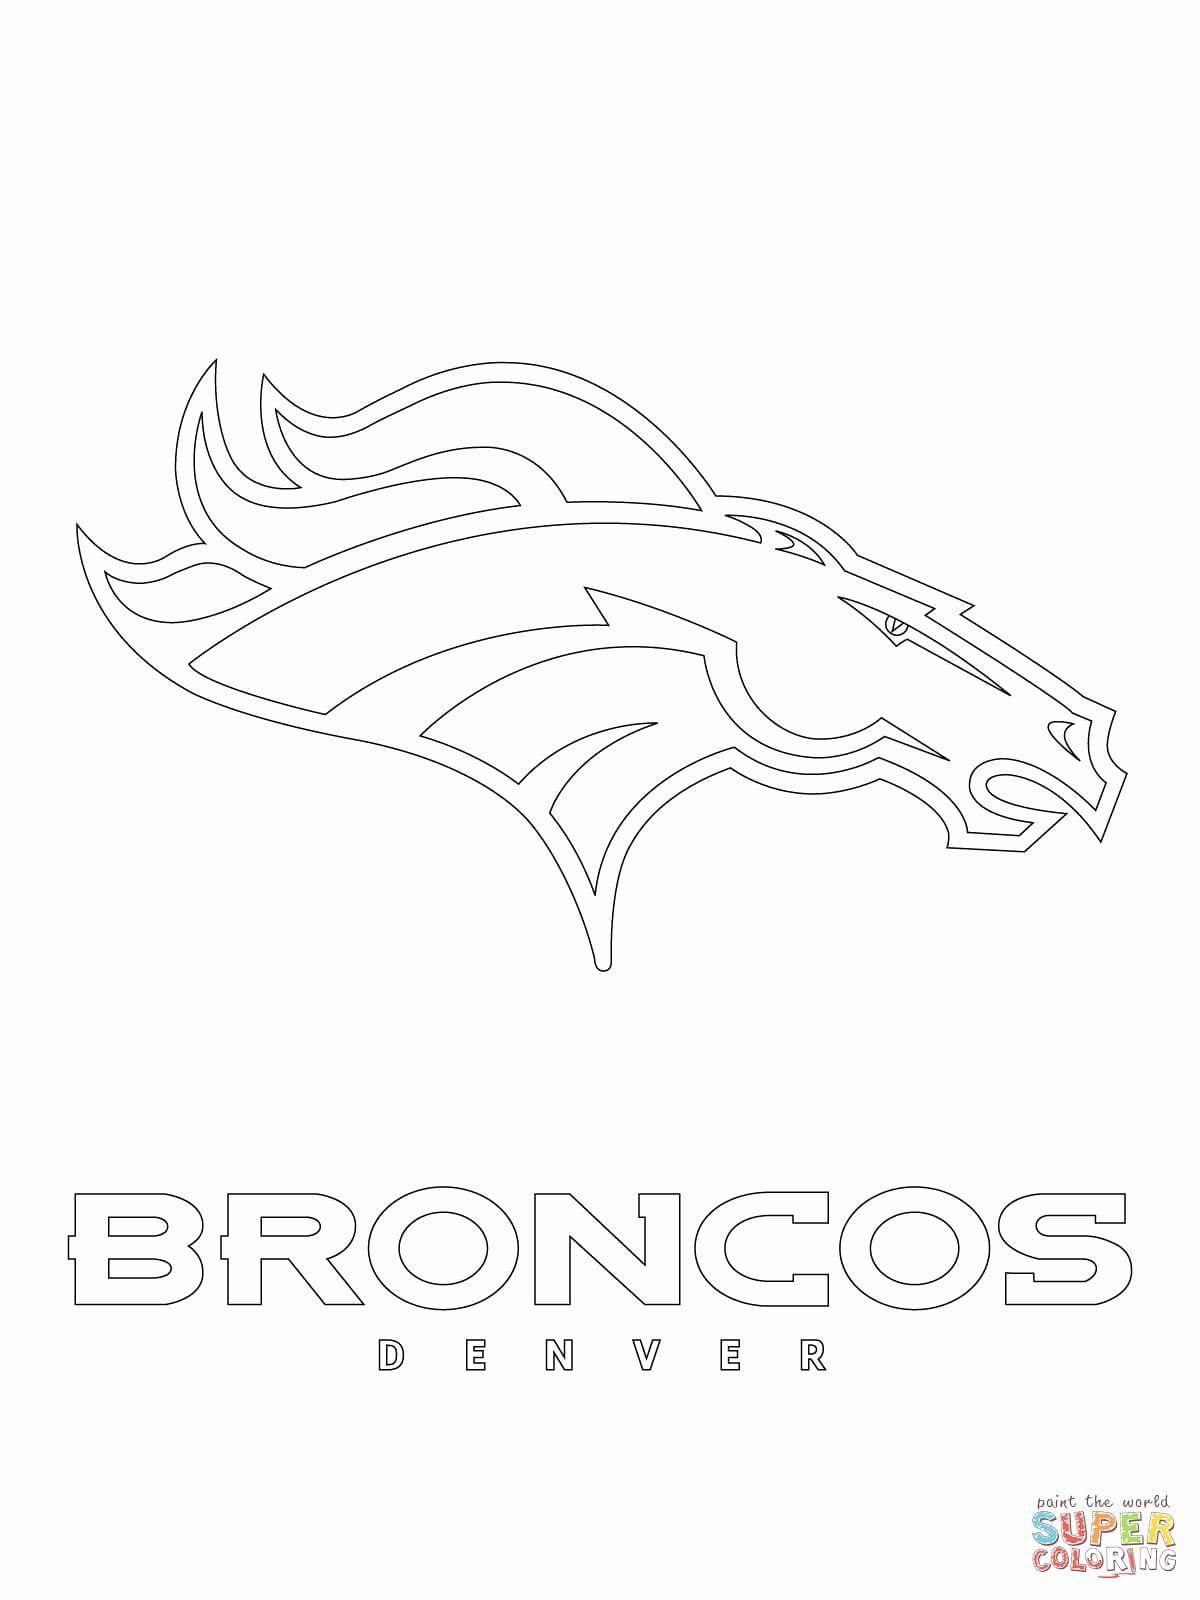 Denver Broncos Coloring Page Inspirational Denver Broncos Logo Coloring Page In 2020 Broncos Logo Denver Broncos Broncos